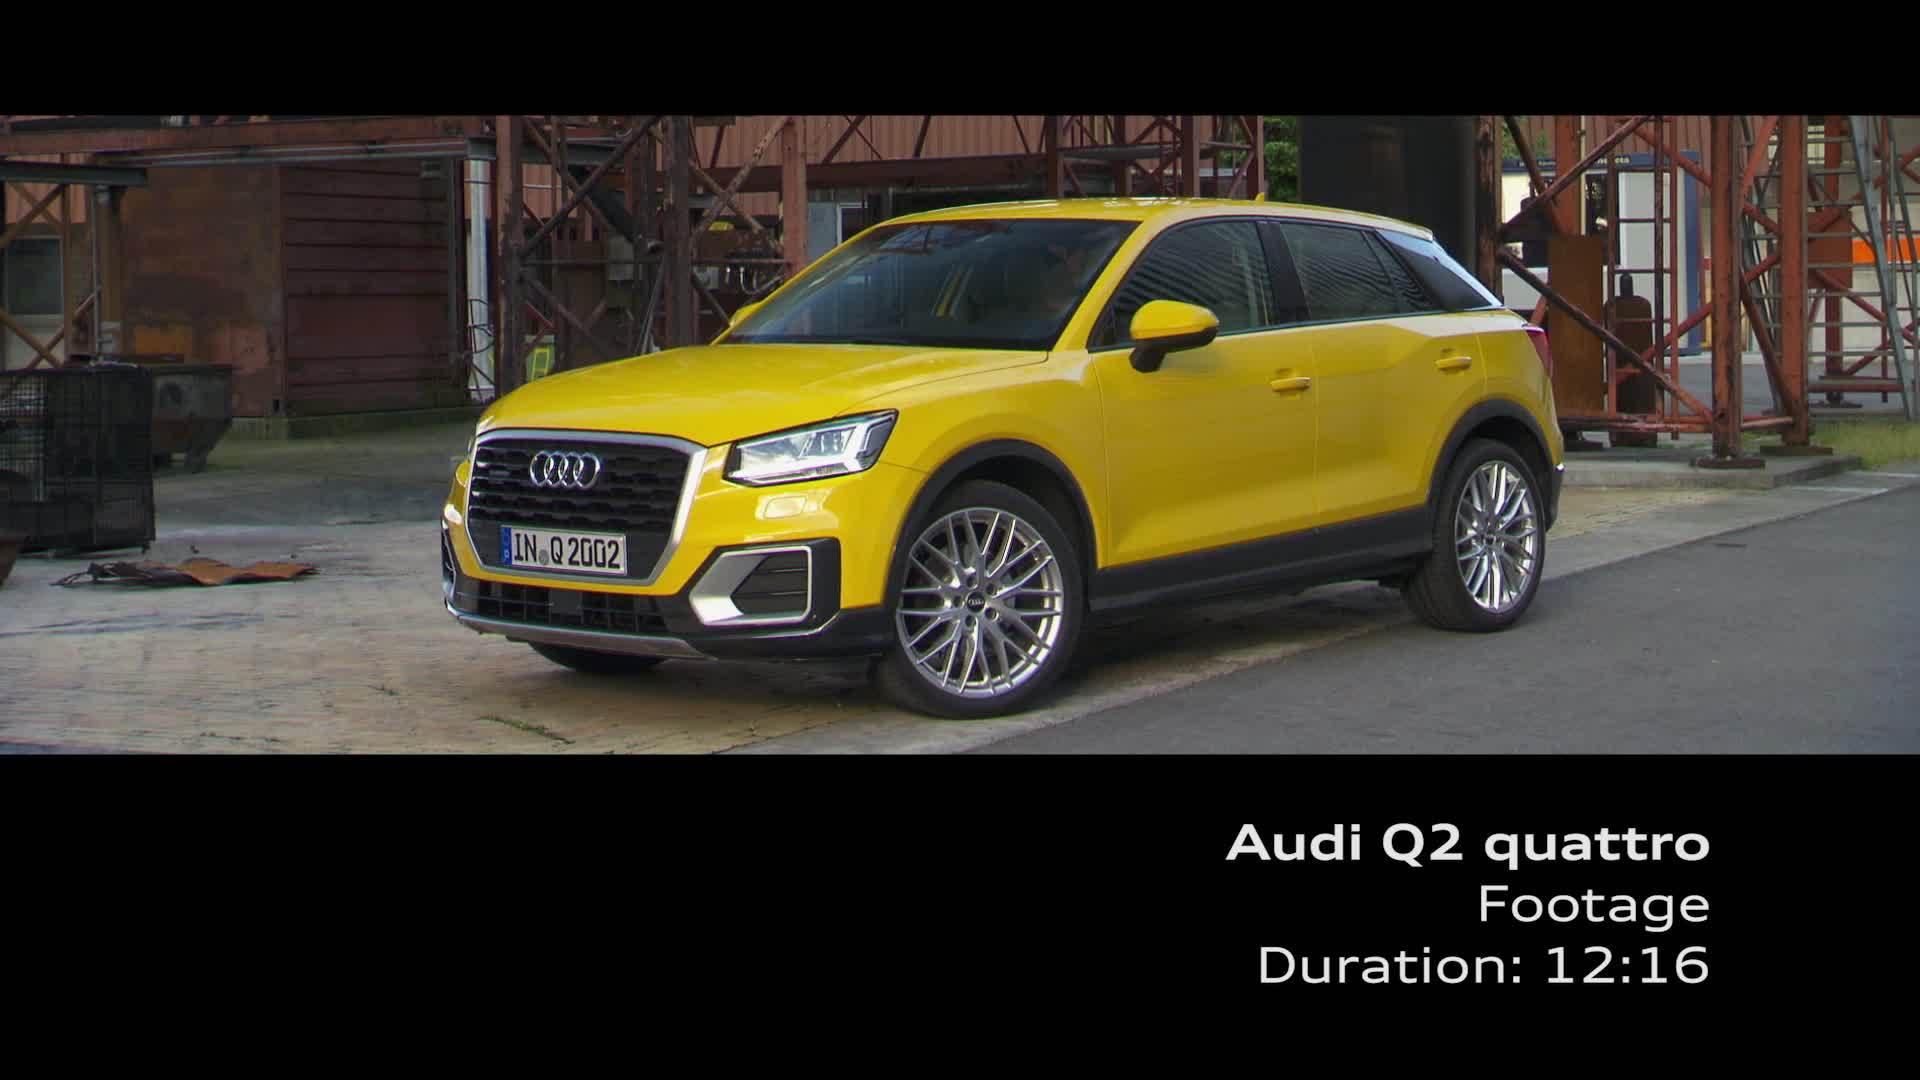 Audi Q2 - Footage on Location, Vegas Yellow